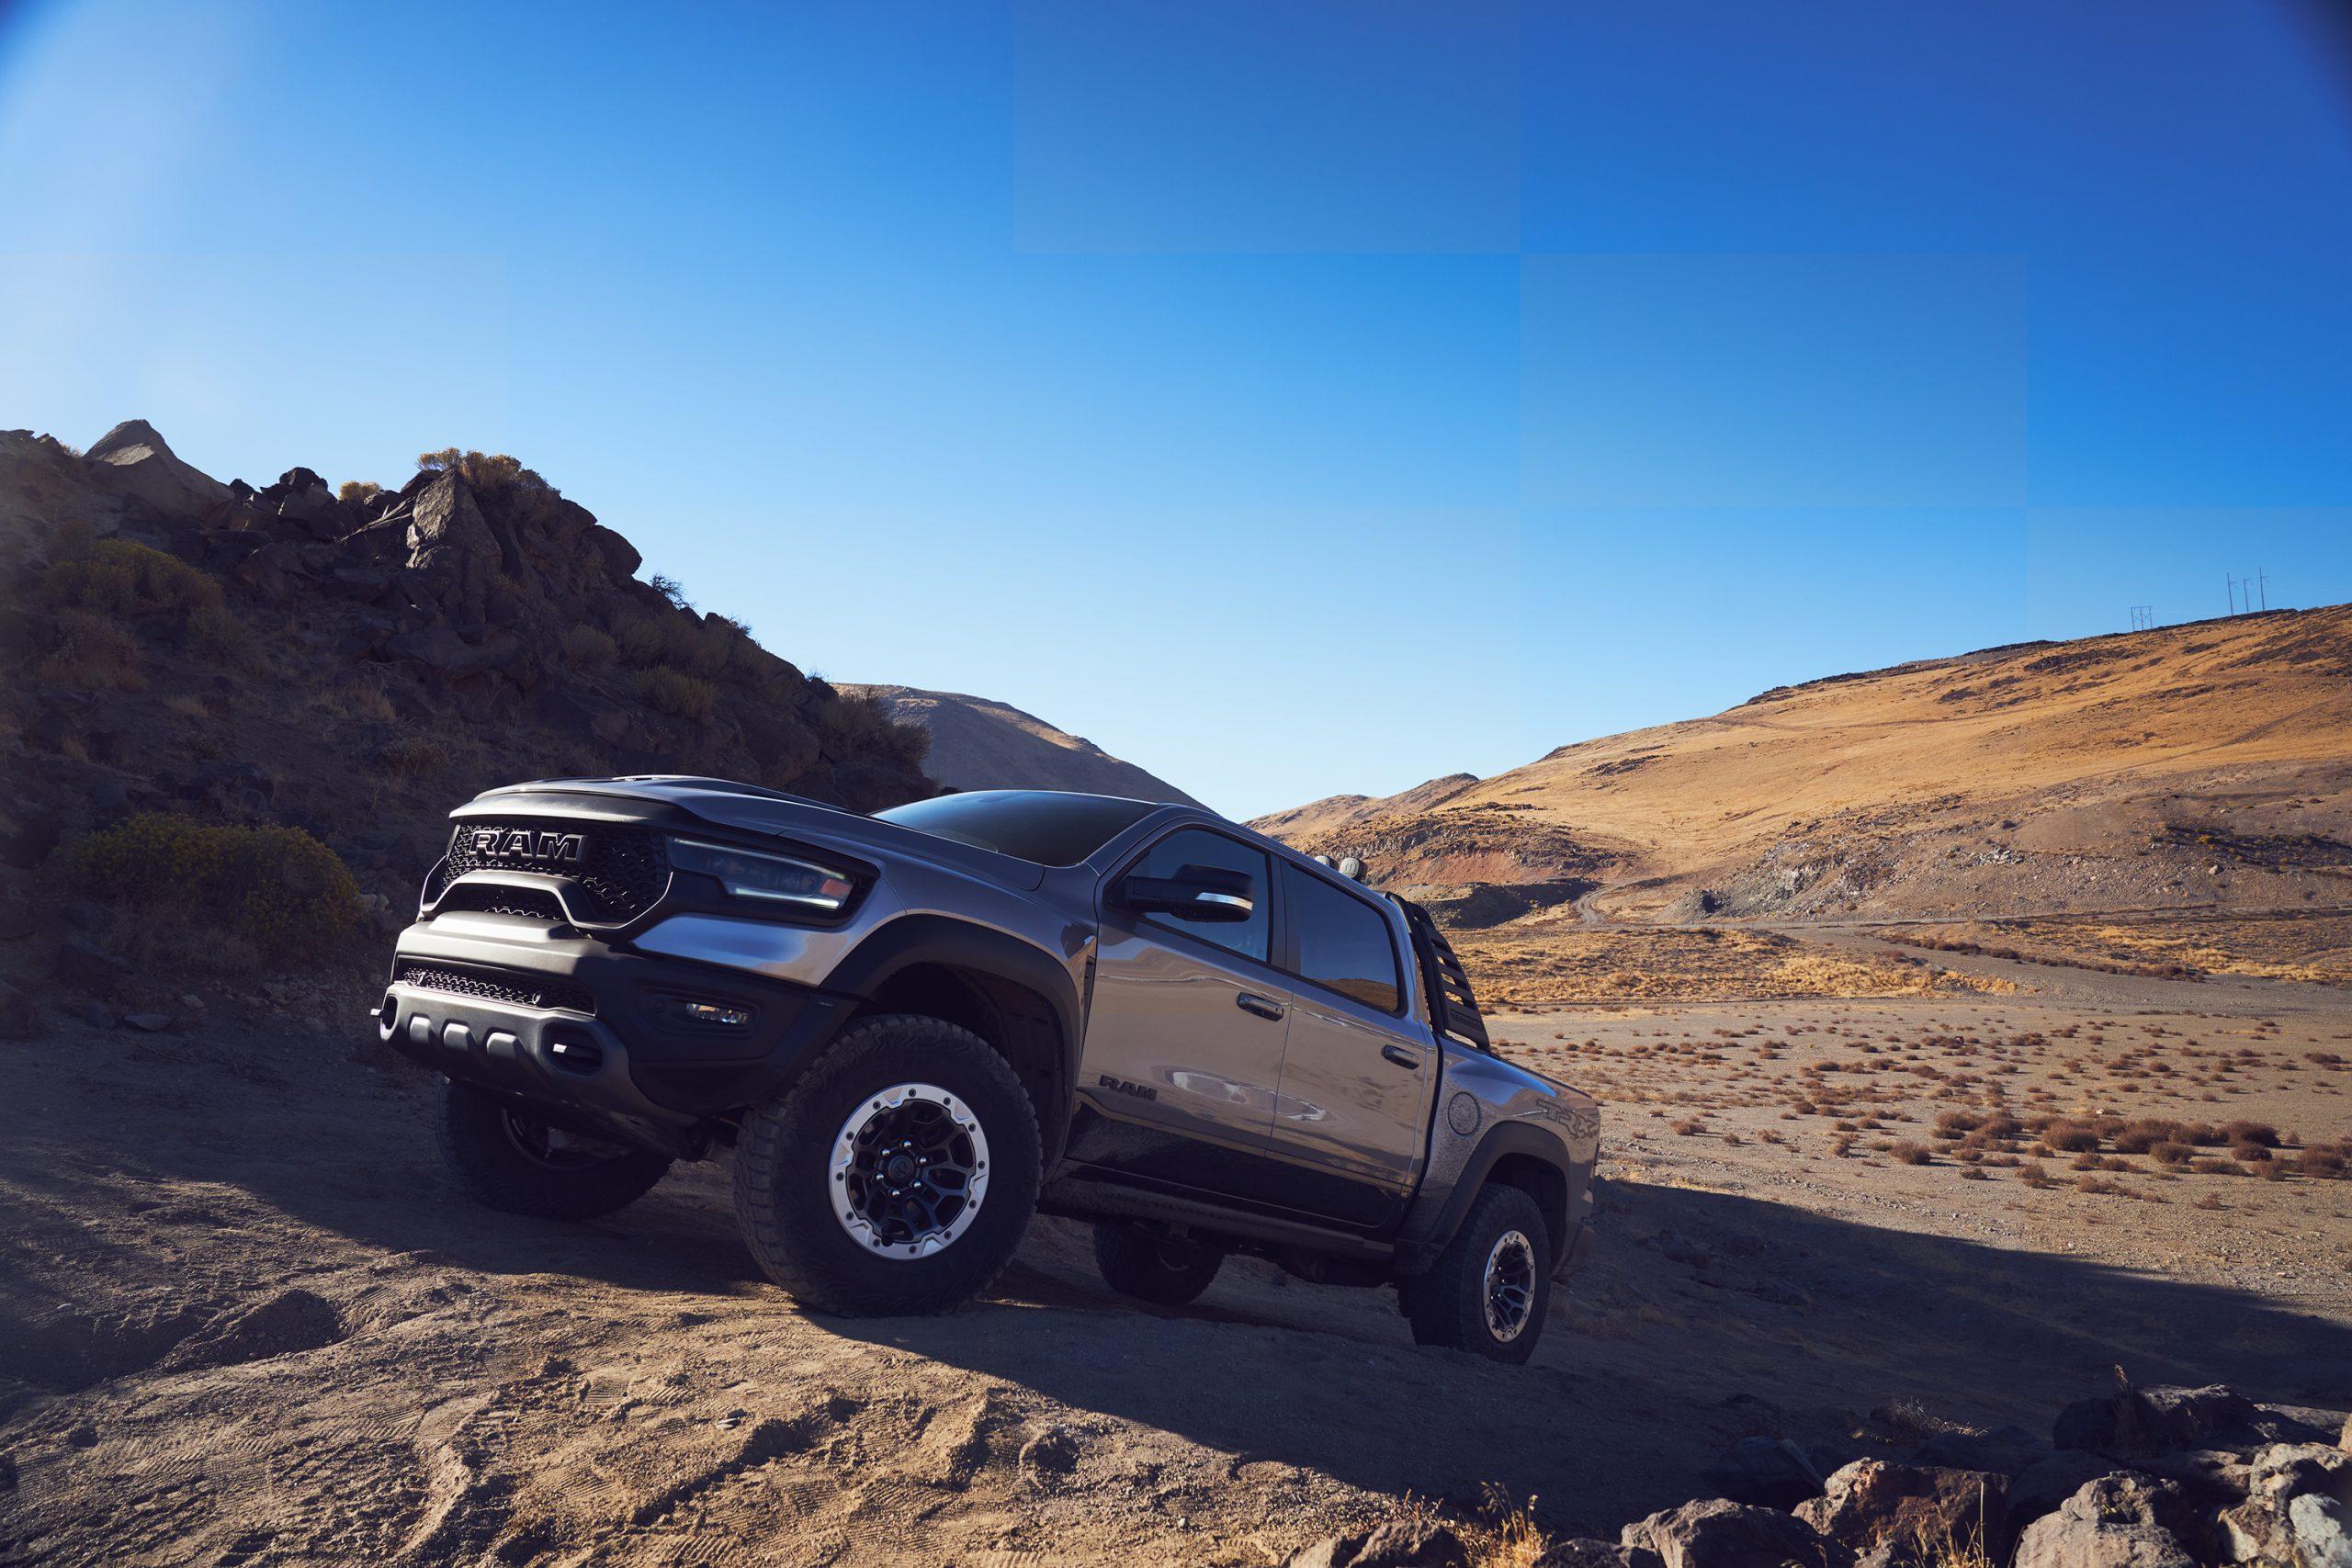 2021 Ram 1500 TRX front three-quarter